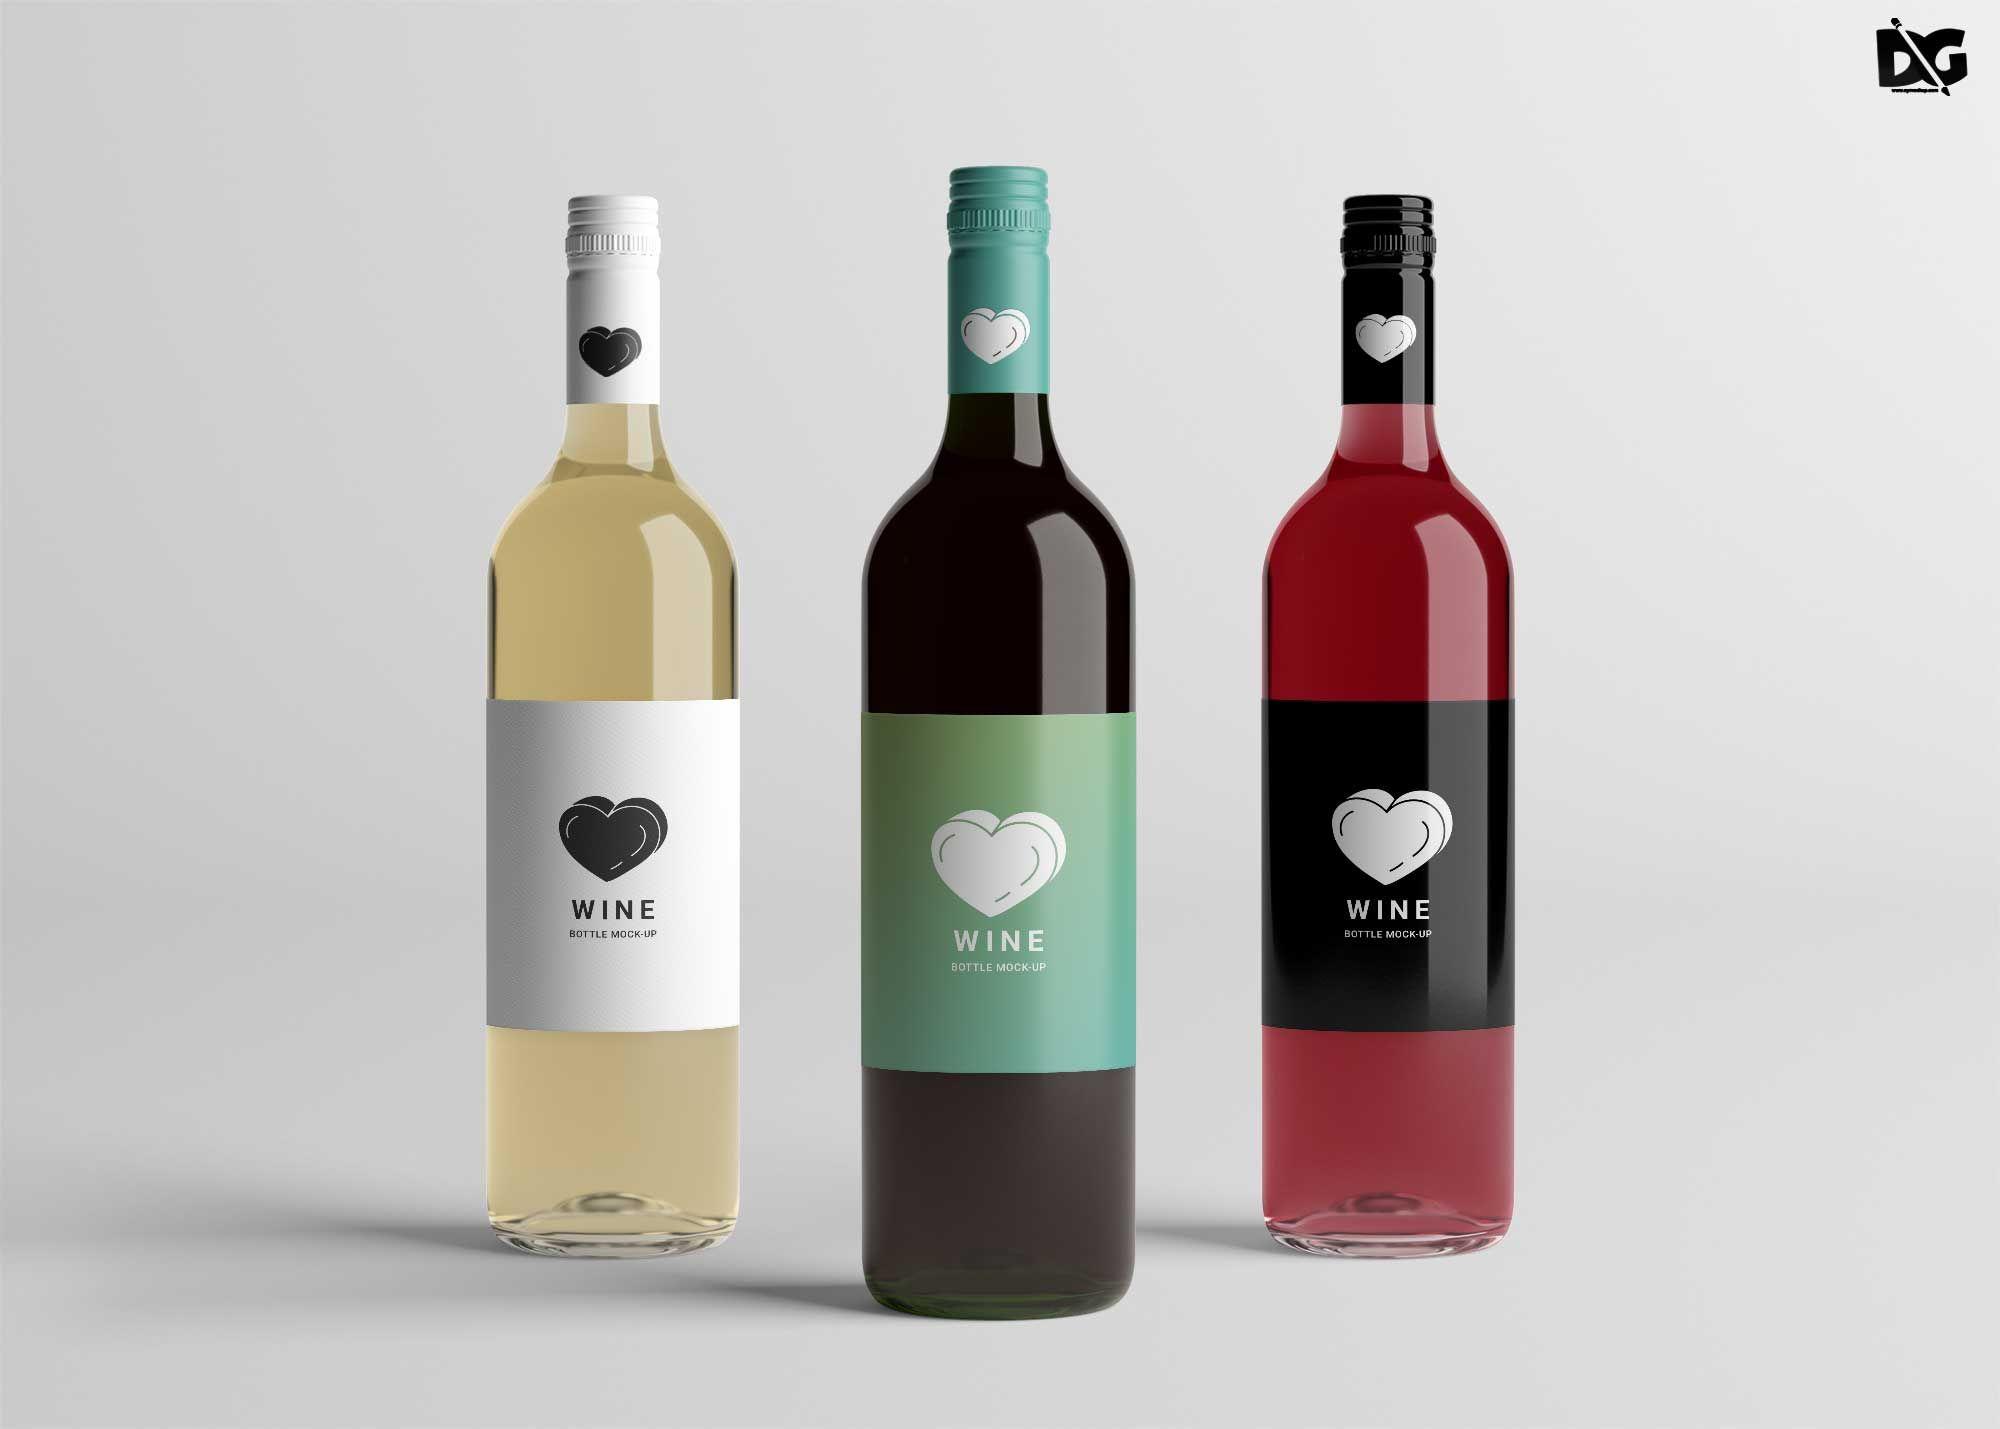 Download Free Download Wine Psd Bottle Label Designs Mockup Design Mockup Free Wine Bottle Label Design Bottle Label Design